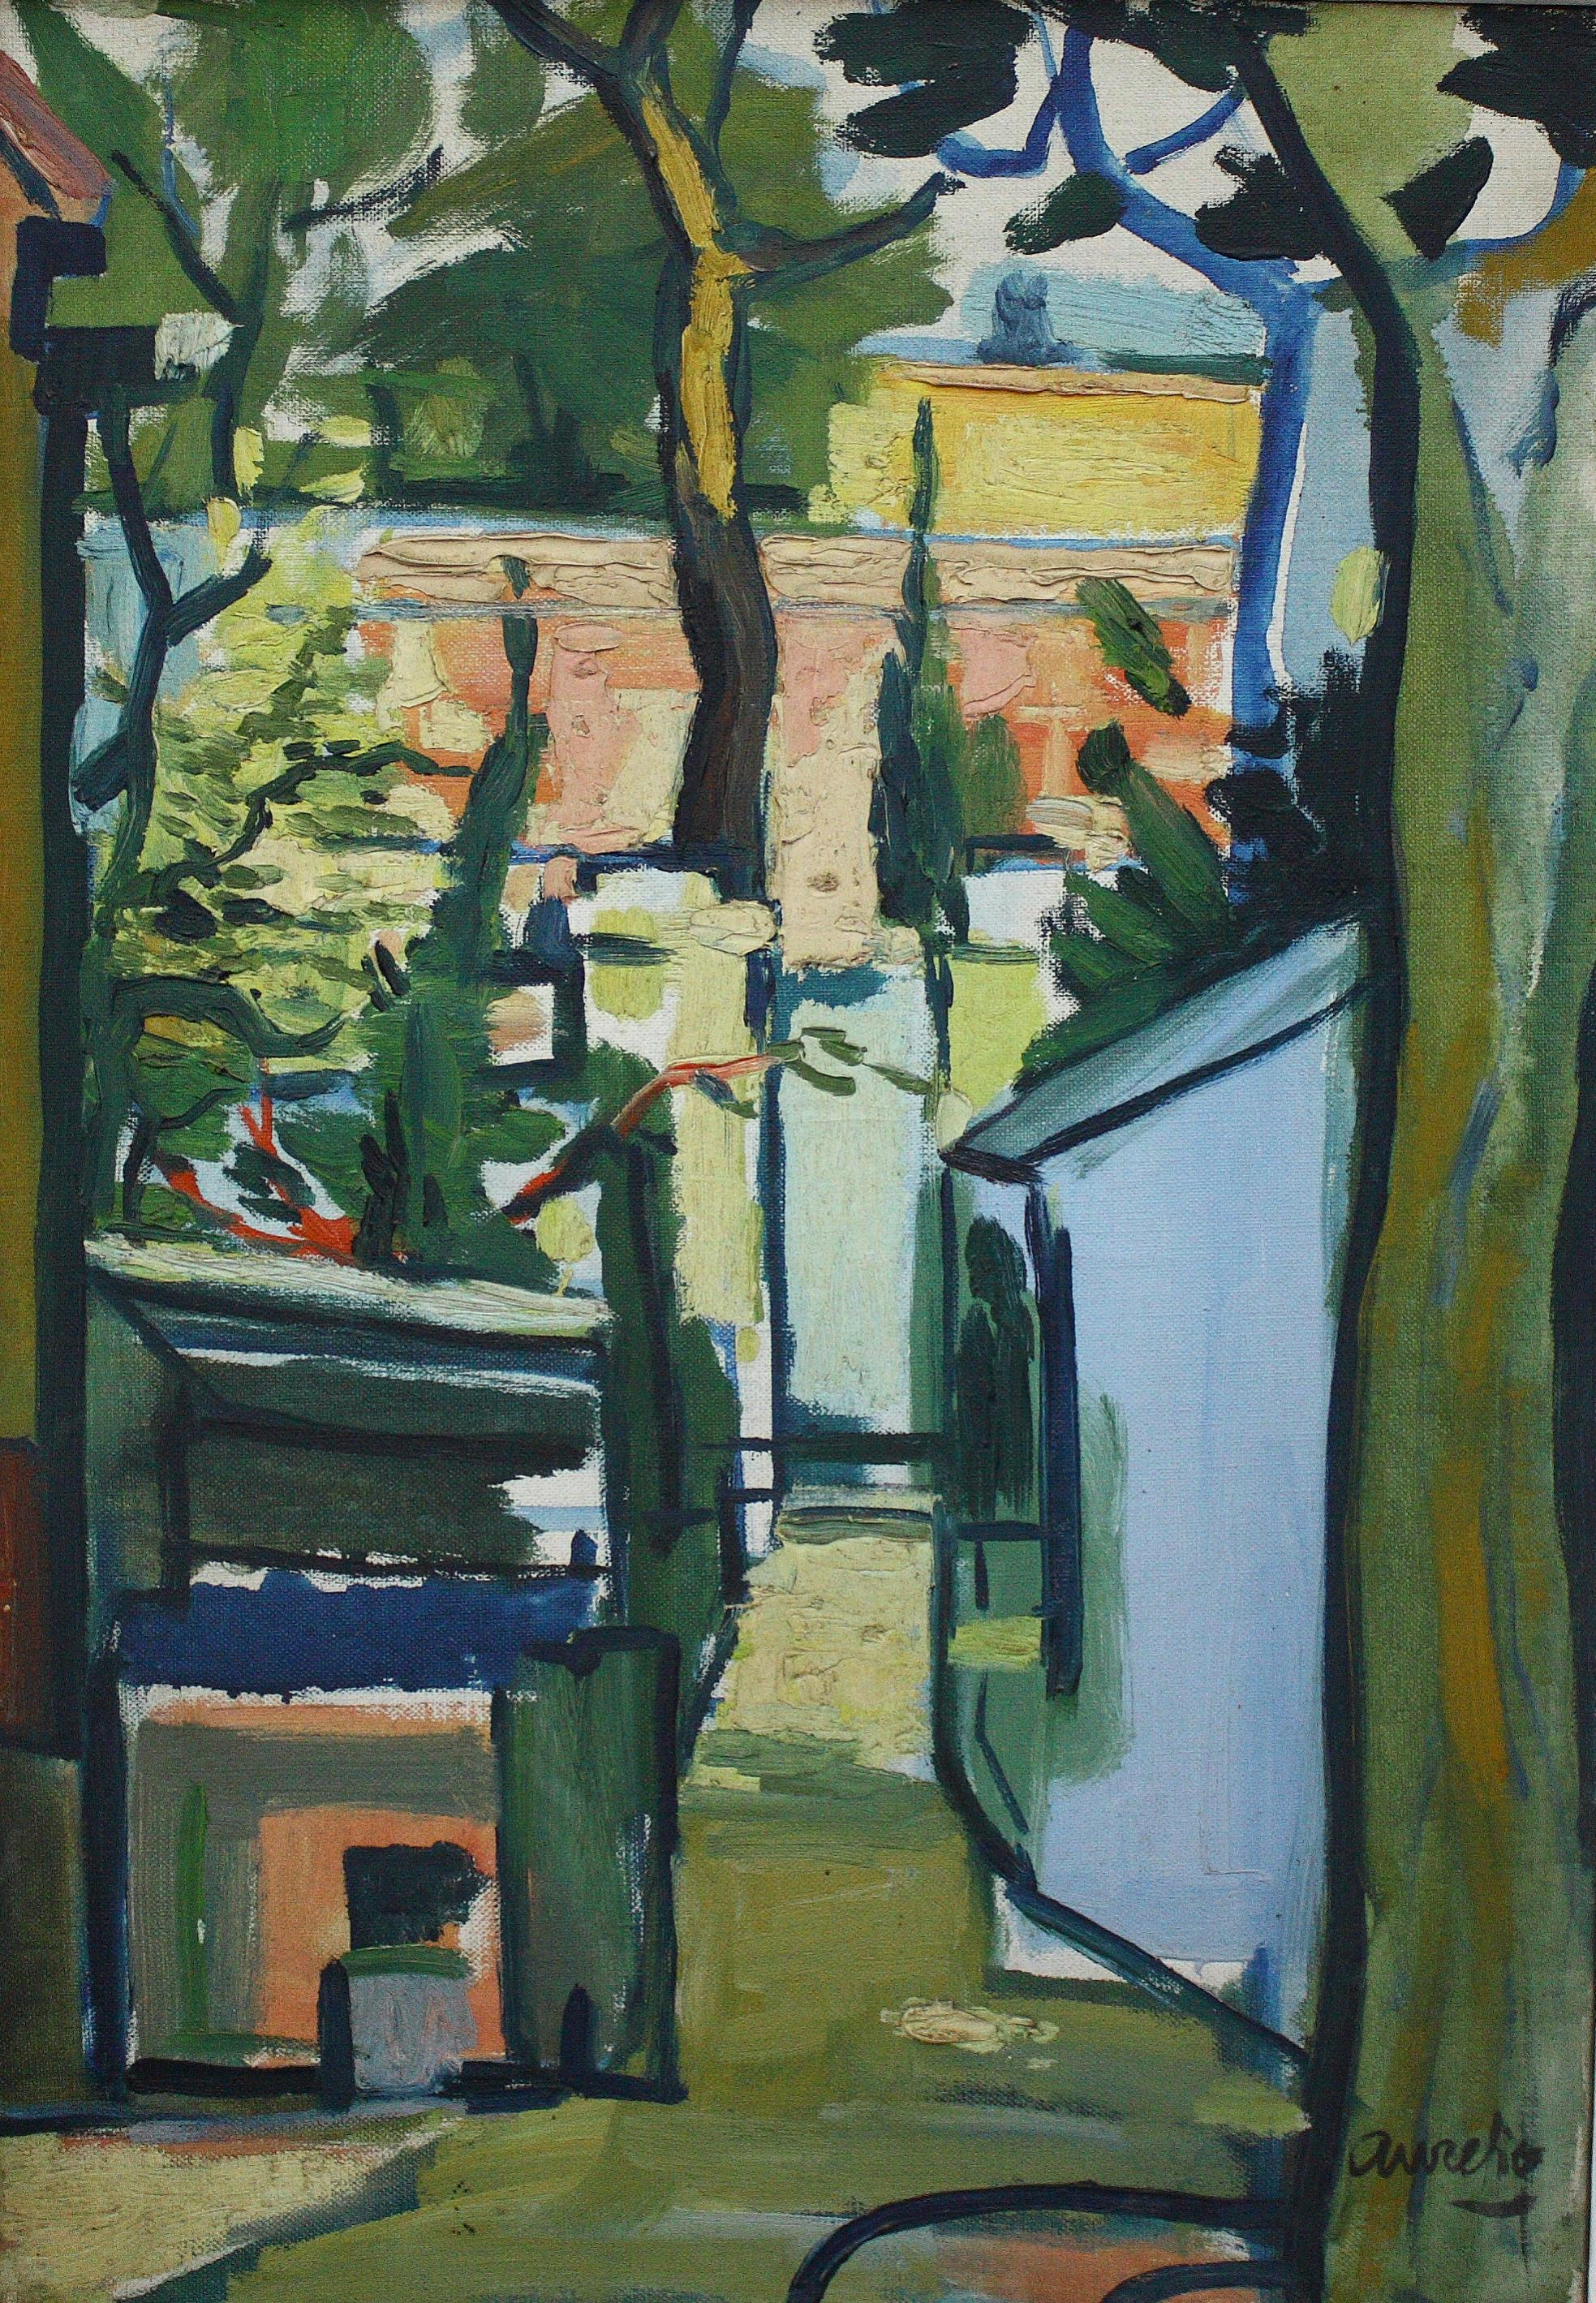 Aurelio Pérez. Alhama de Murcia 1930 – 2000. Jardín de Beaumont. Oleo sobre lienzo. Medidas de 55 x 38. Año 1957.